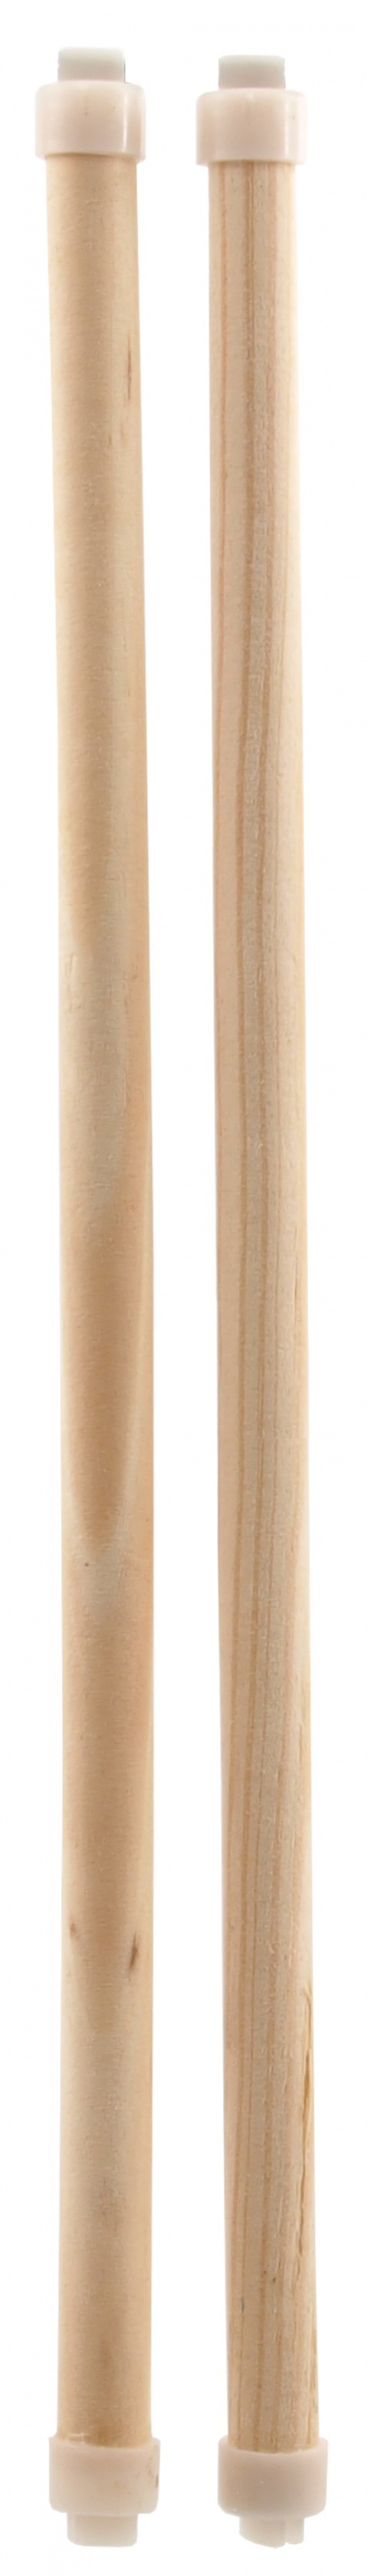 Bidýlko BIRD JEWEL dřevěné 61cm 2ks